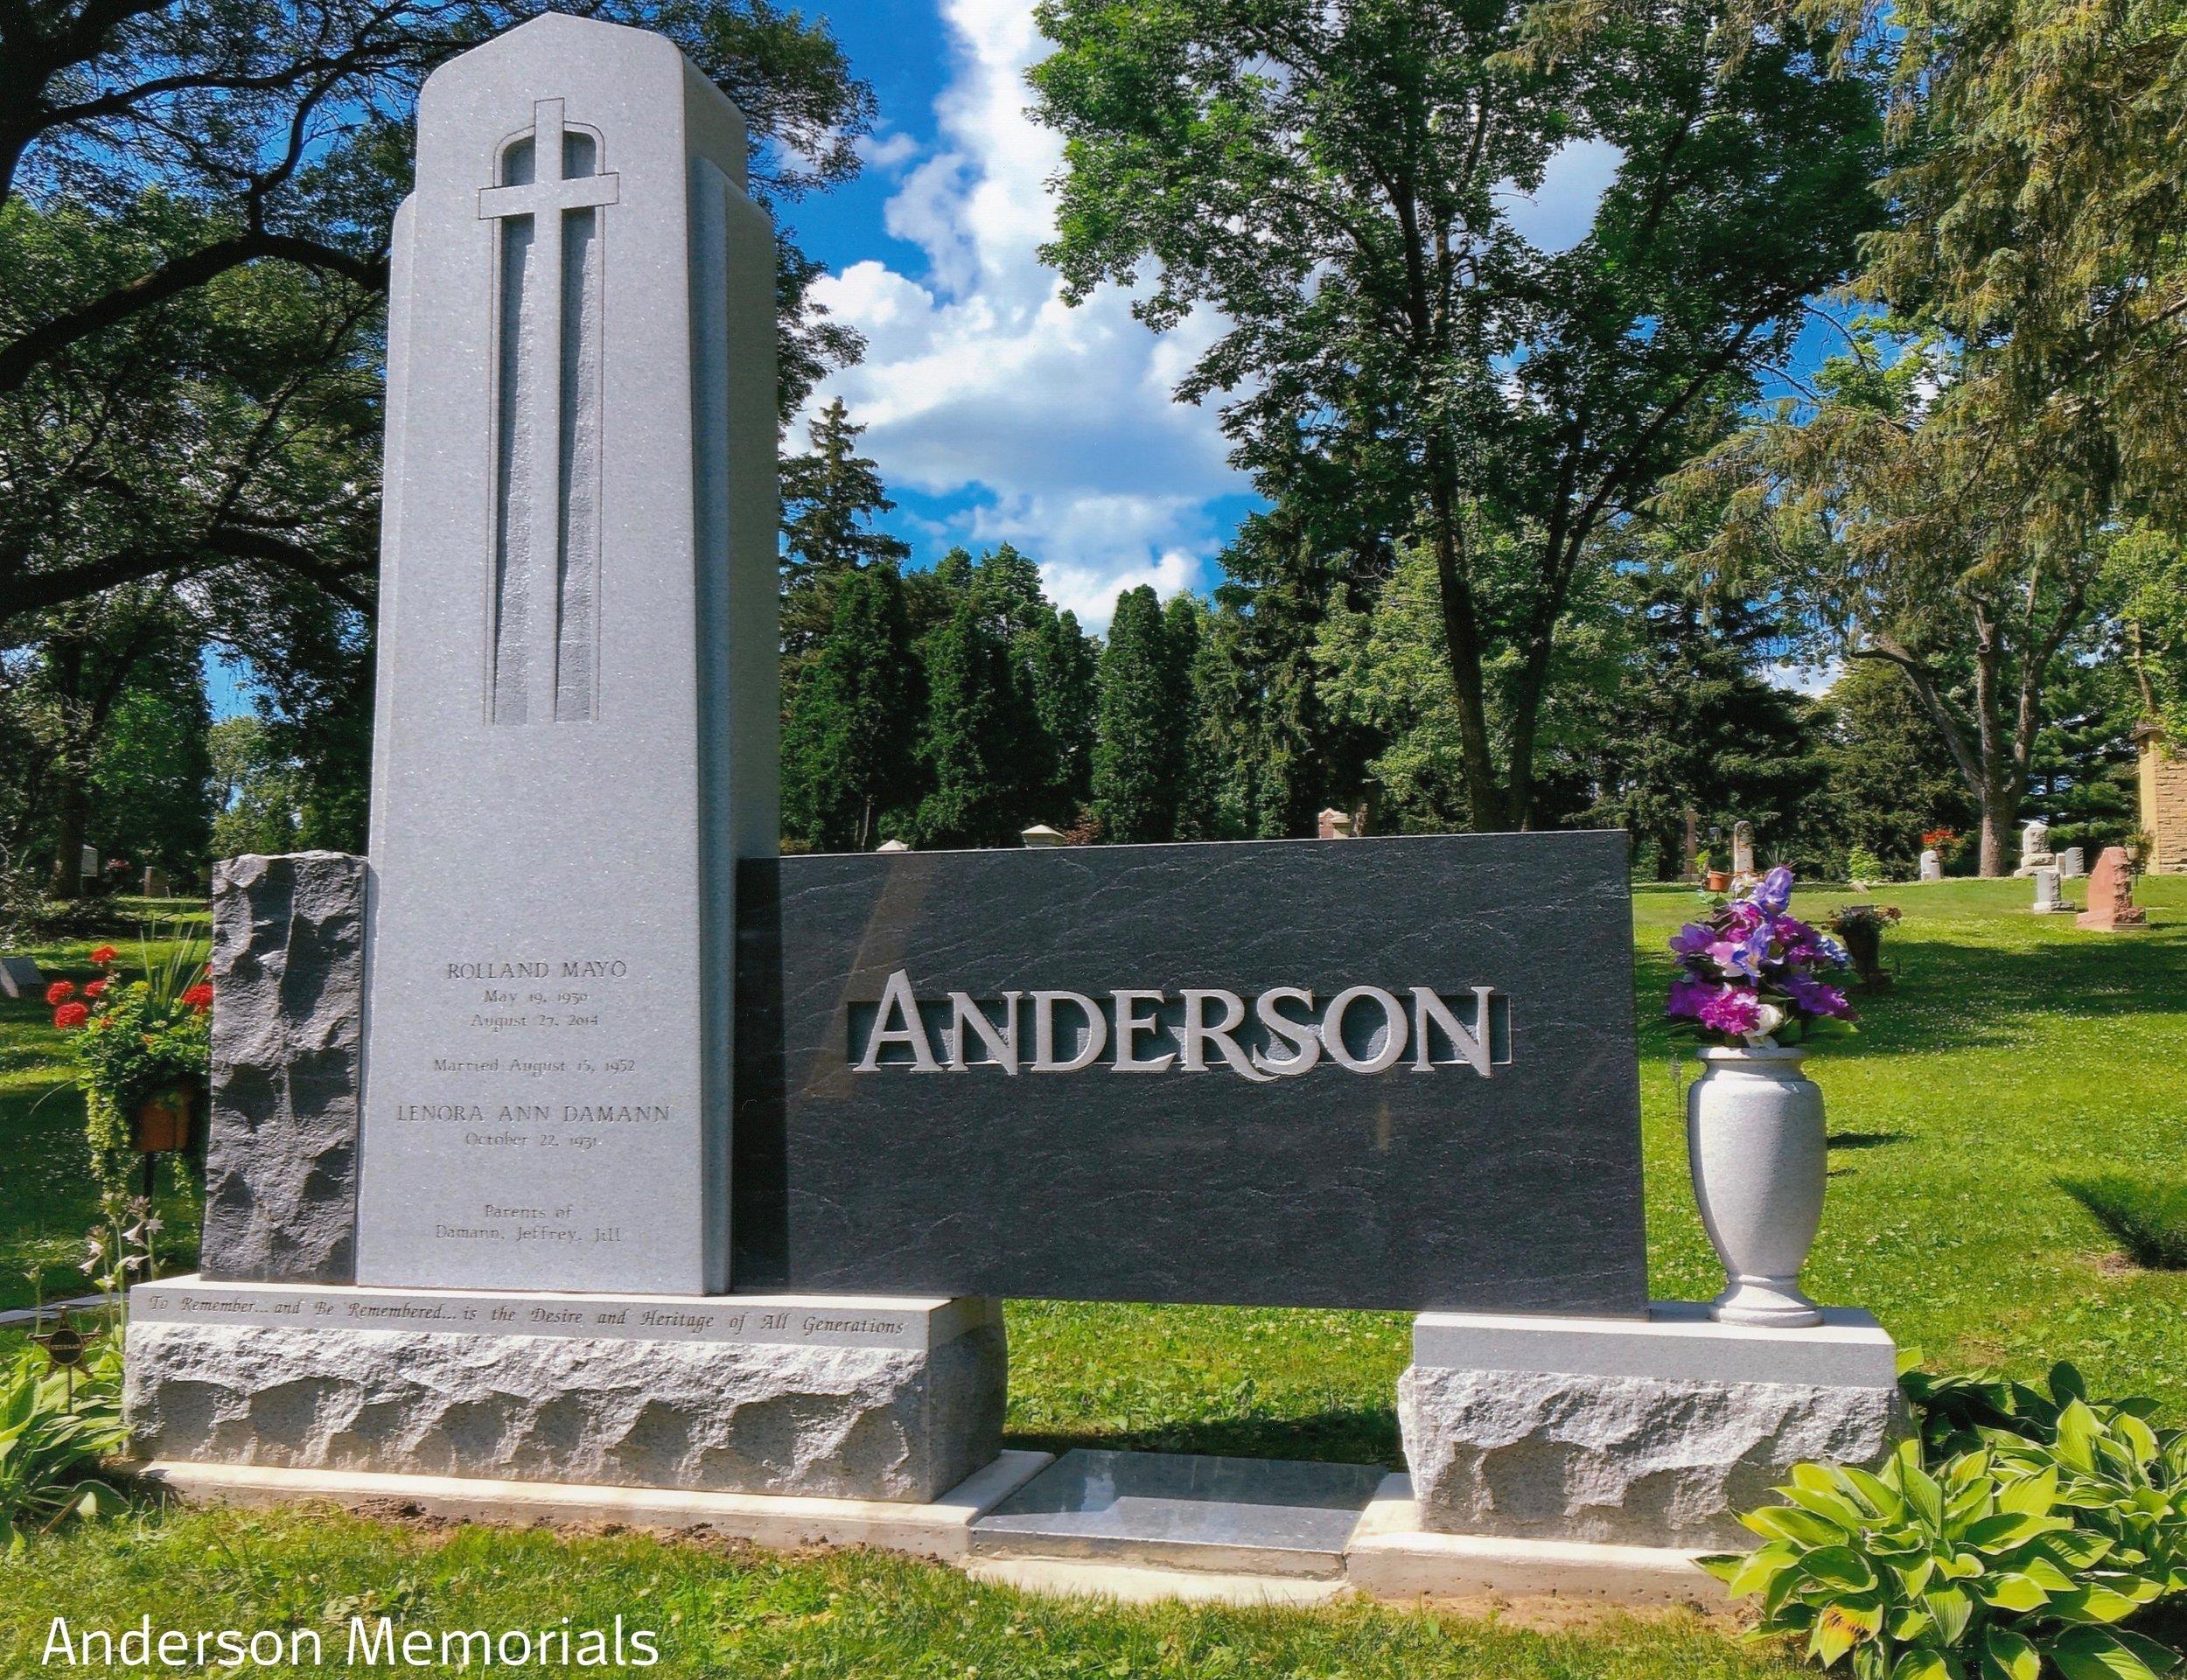 "Winner of the Eugene H. Faehnle, FAICA Trophy ""Anderson"", Anderson Memorials, Jeff Anderson, CM, AICA"